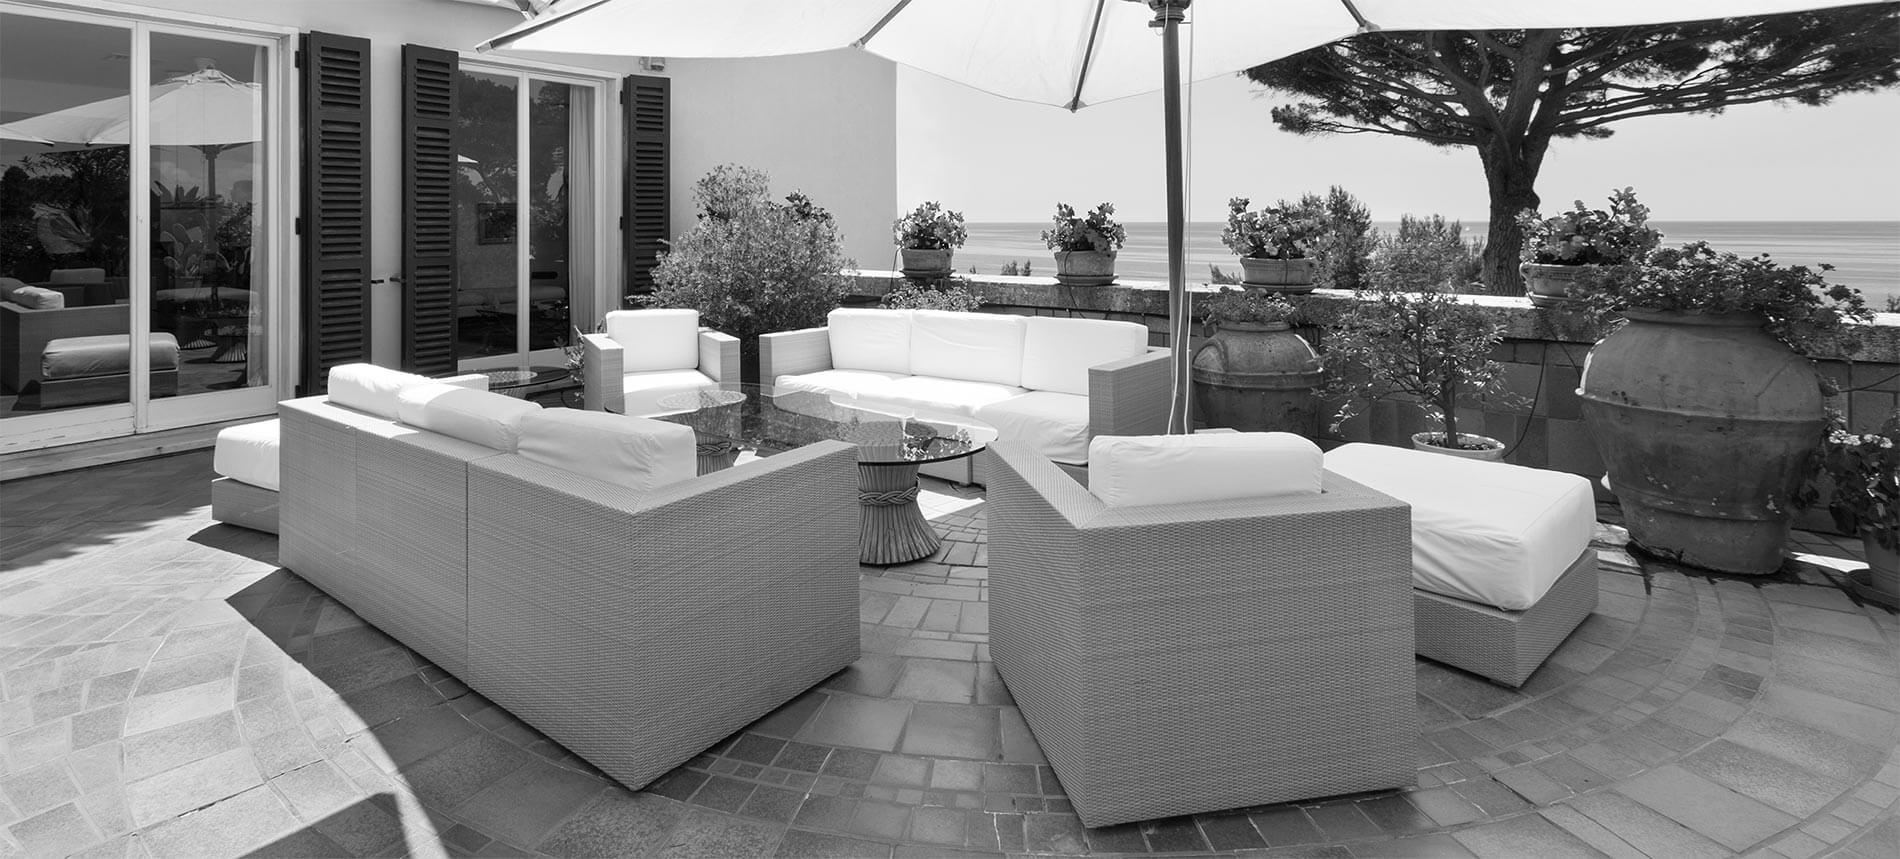 Der Schutzhüllenprofi für Ihre Gartenmöbel | Schutzhüllenprofi